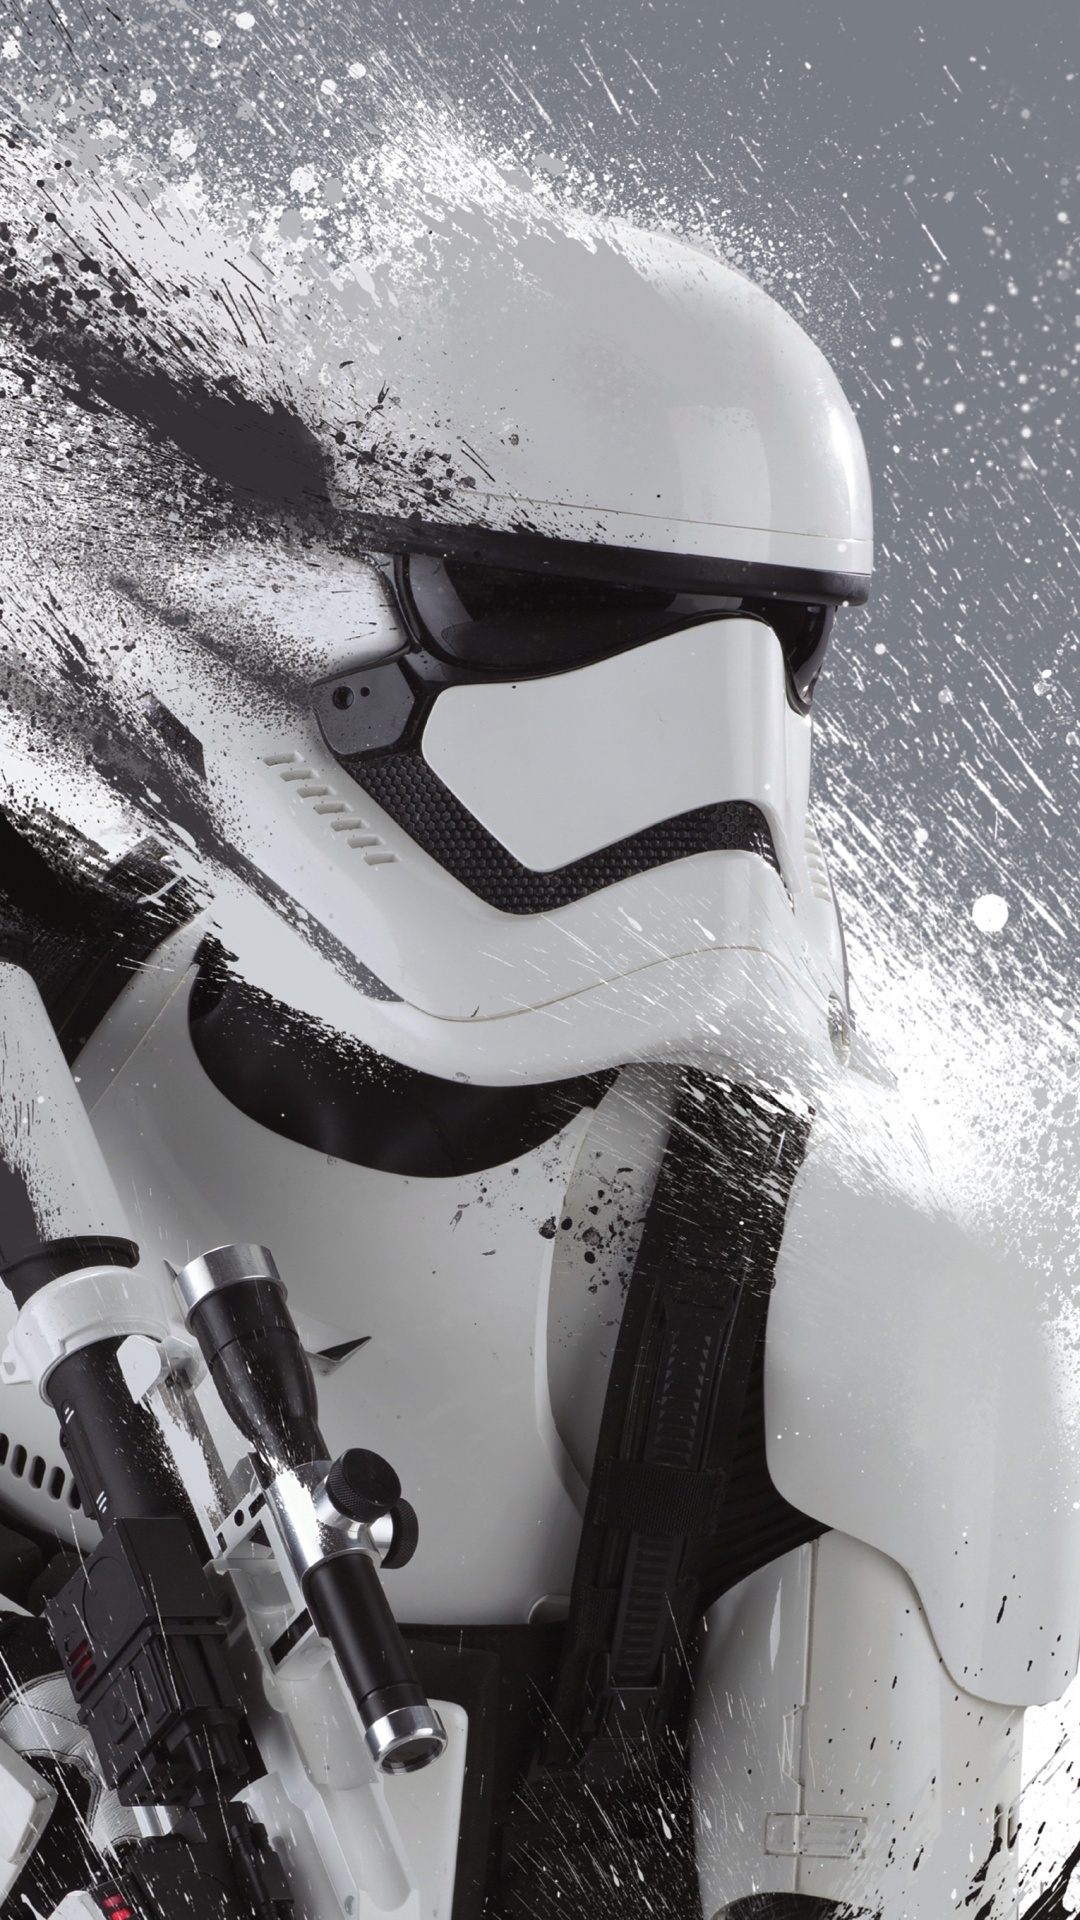 force-awakens-wallpaper (14)